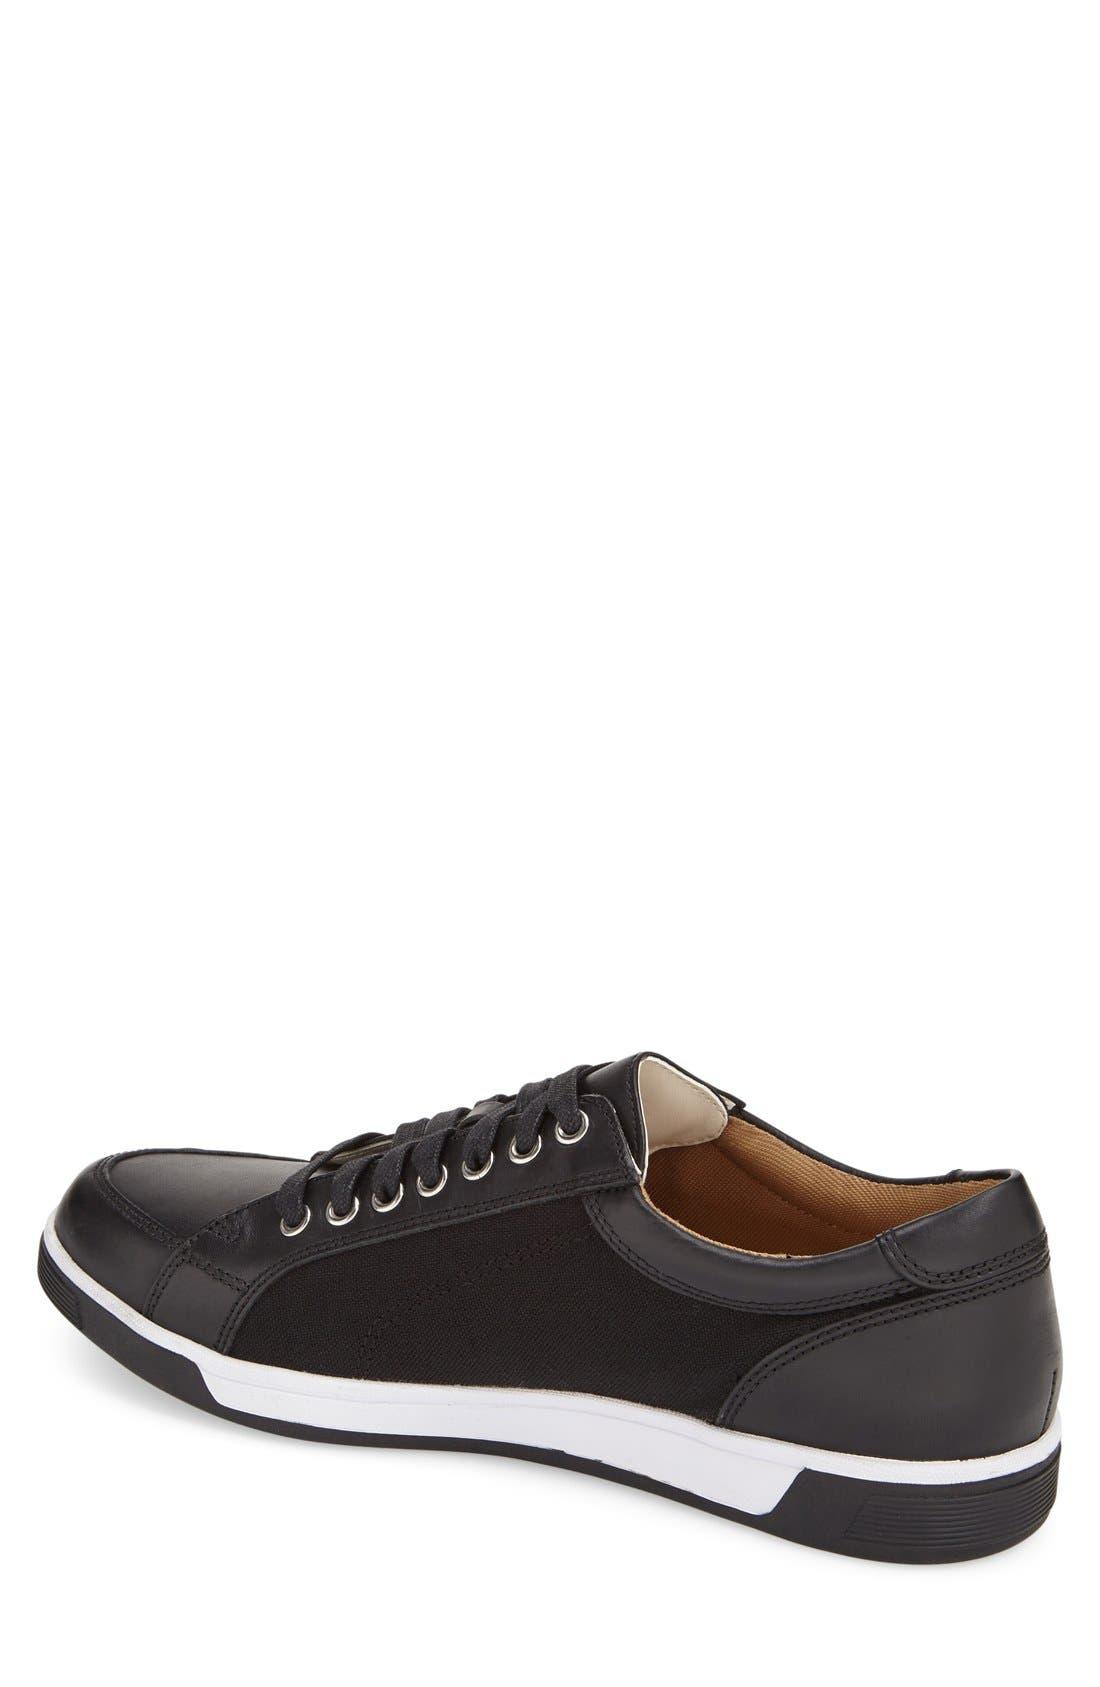 'Vartan Sport Oxford' Sneaker,                             Alternate thumbnail 18, color,